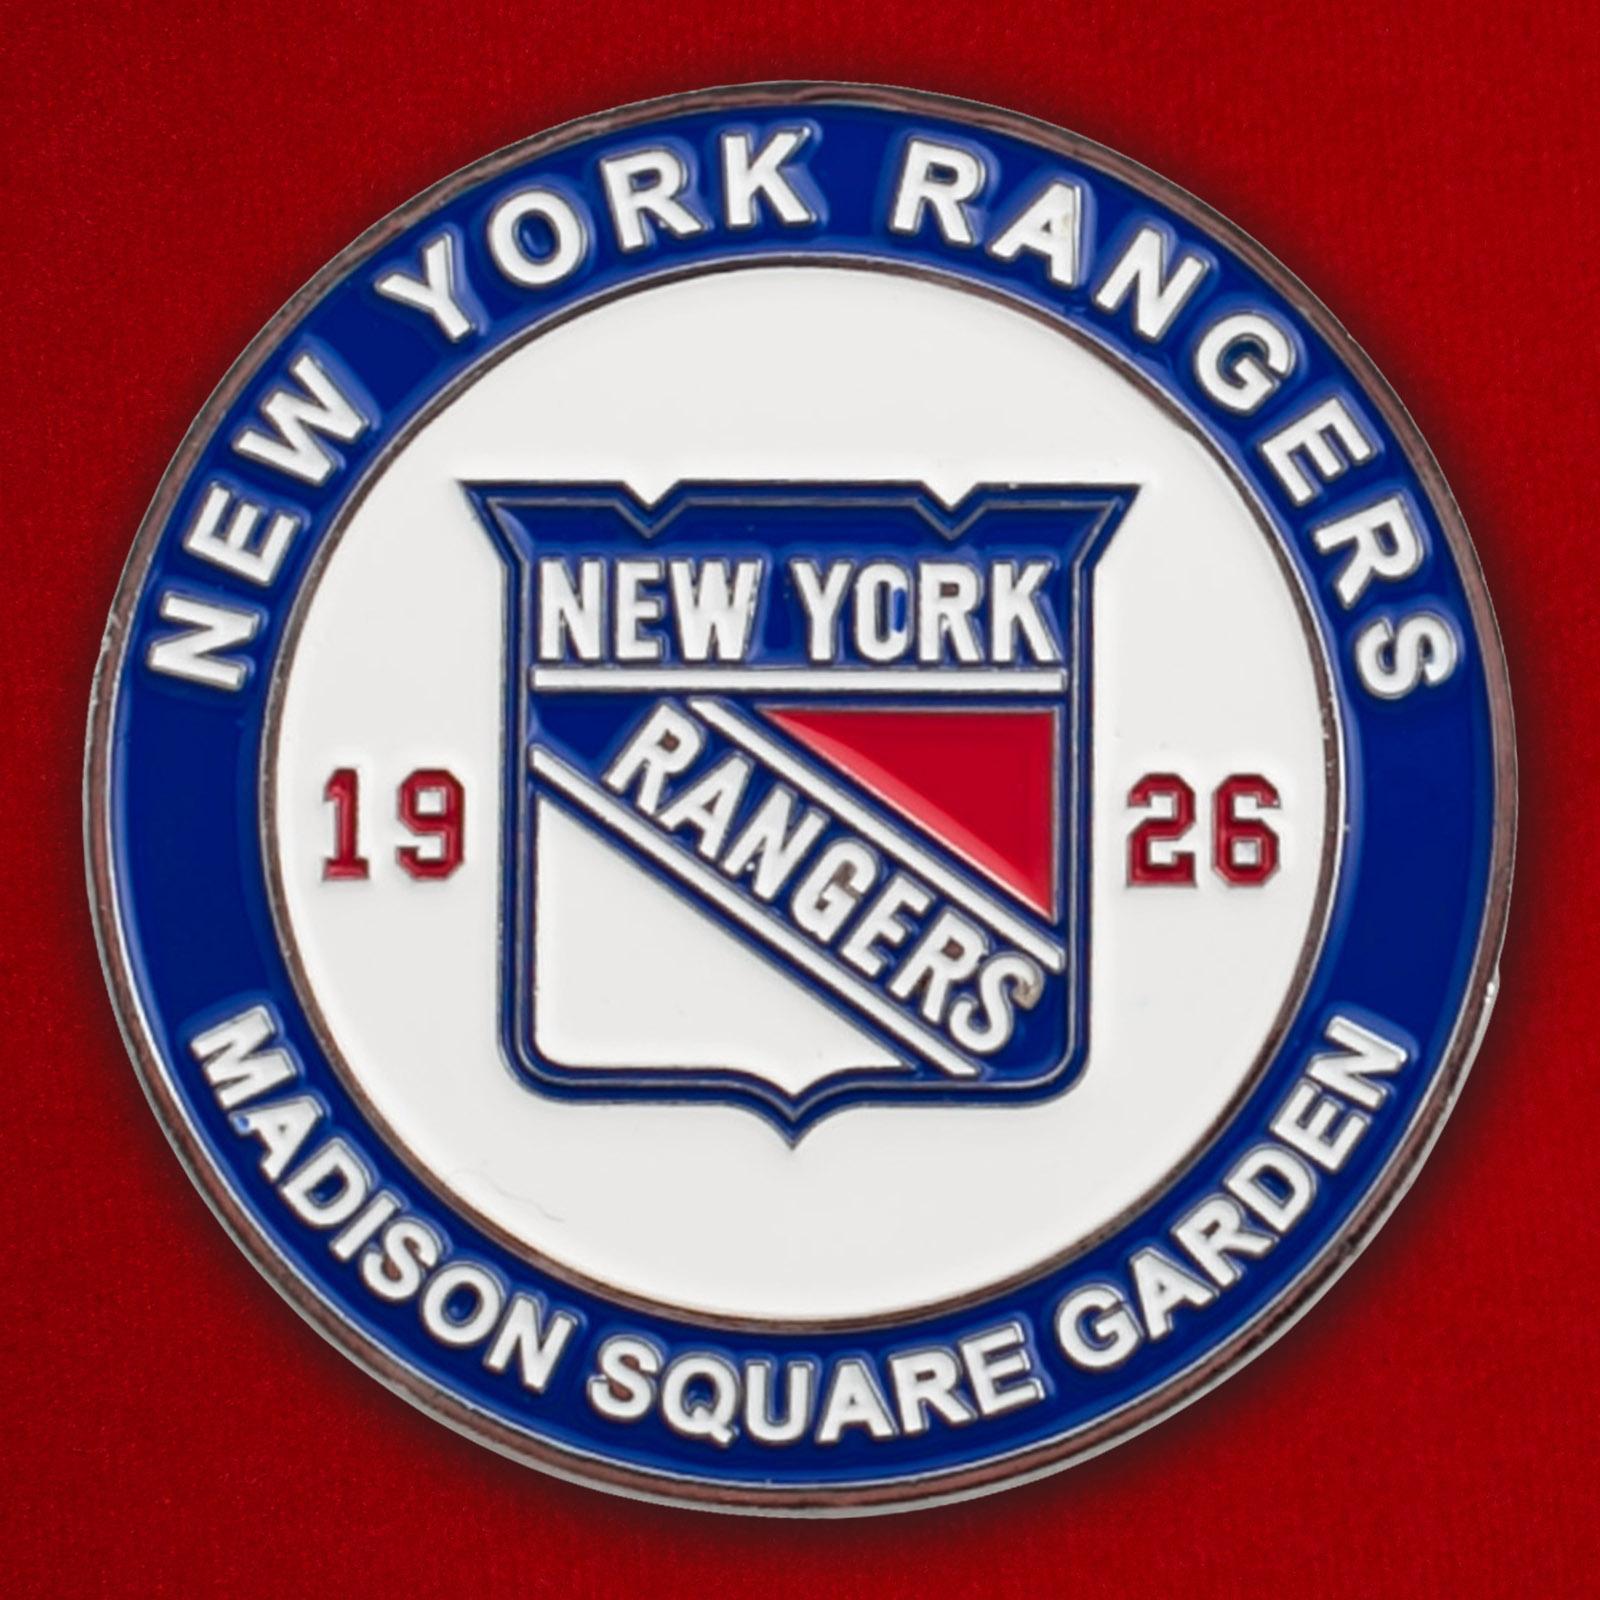 Челлендж коин отряда полиции по охране матчей клуба НХЛ New York Rangers